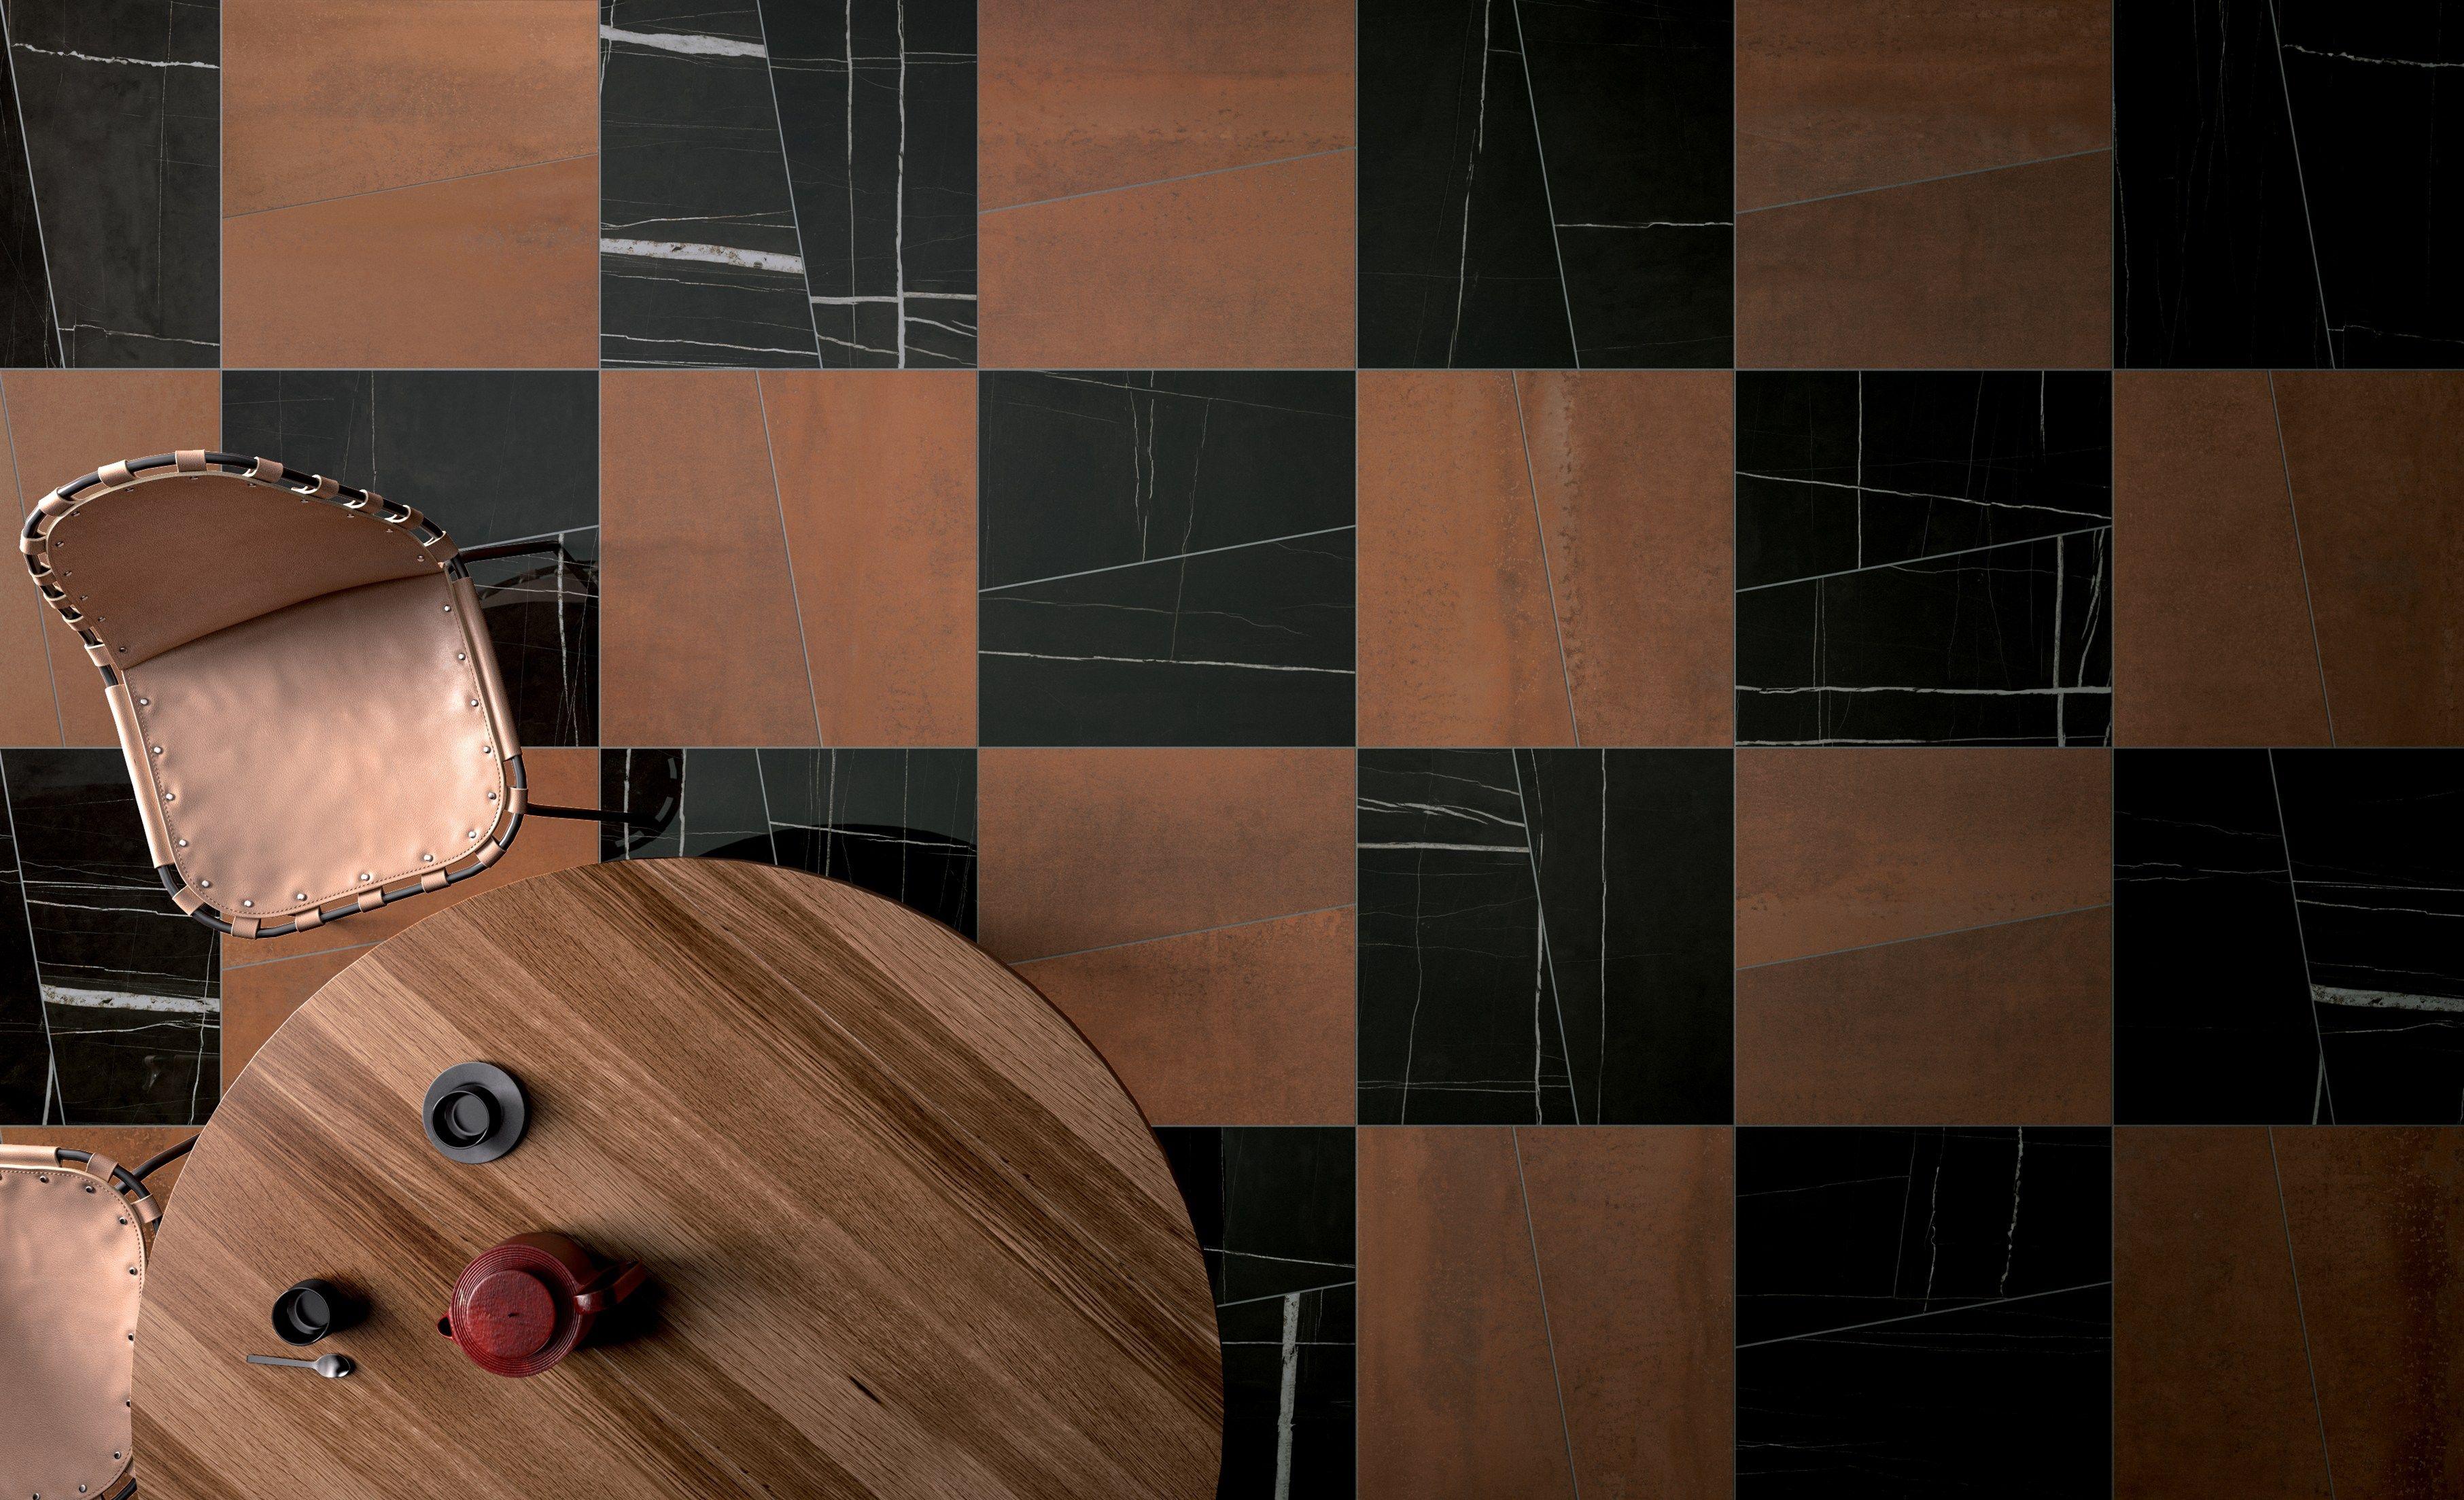 wall/floor tiles match sahara noir glossy by ceramica fondovalle, Wohnzimmer dekoo